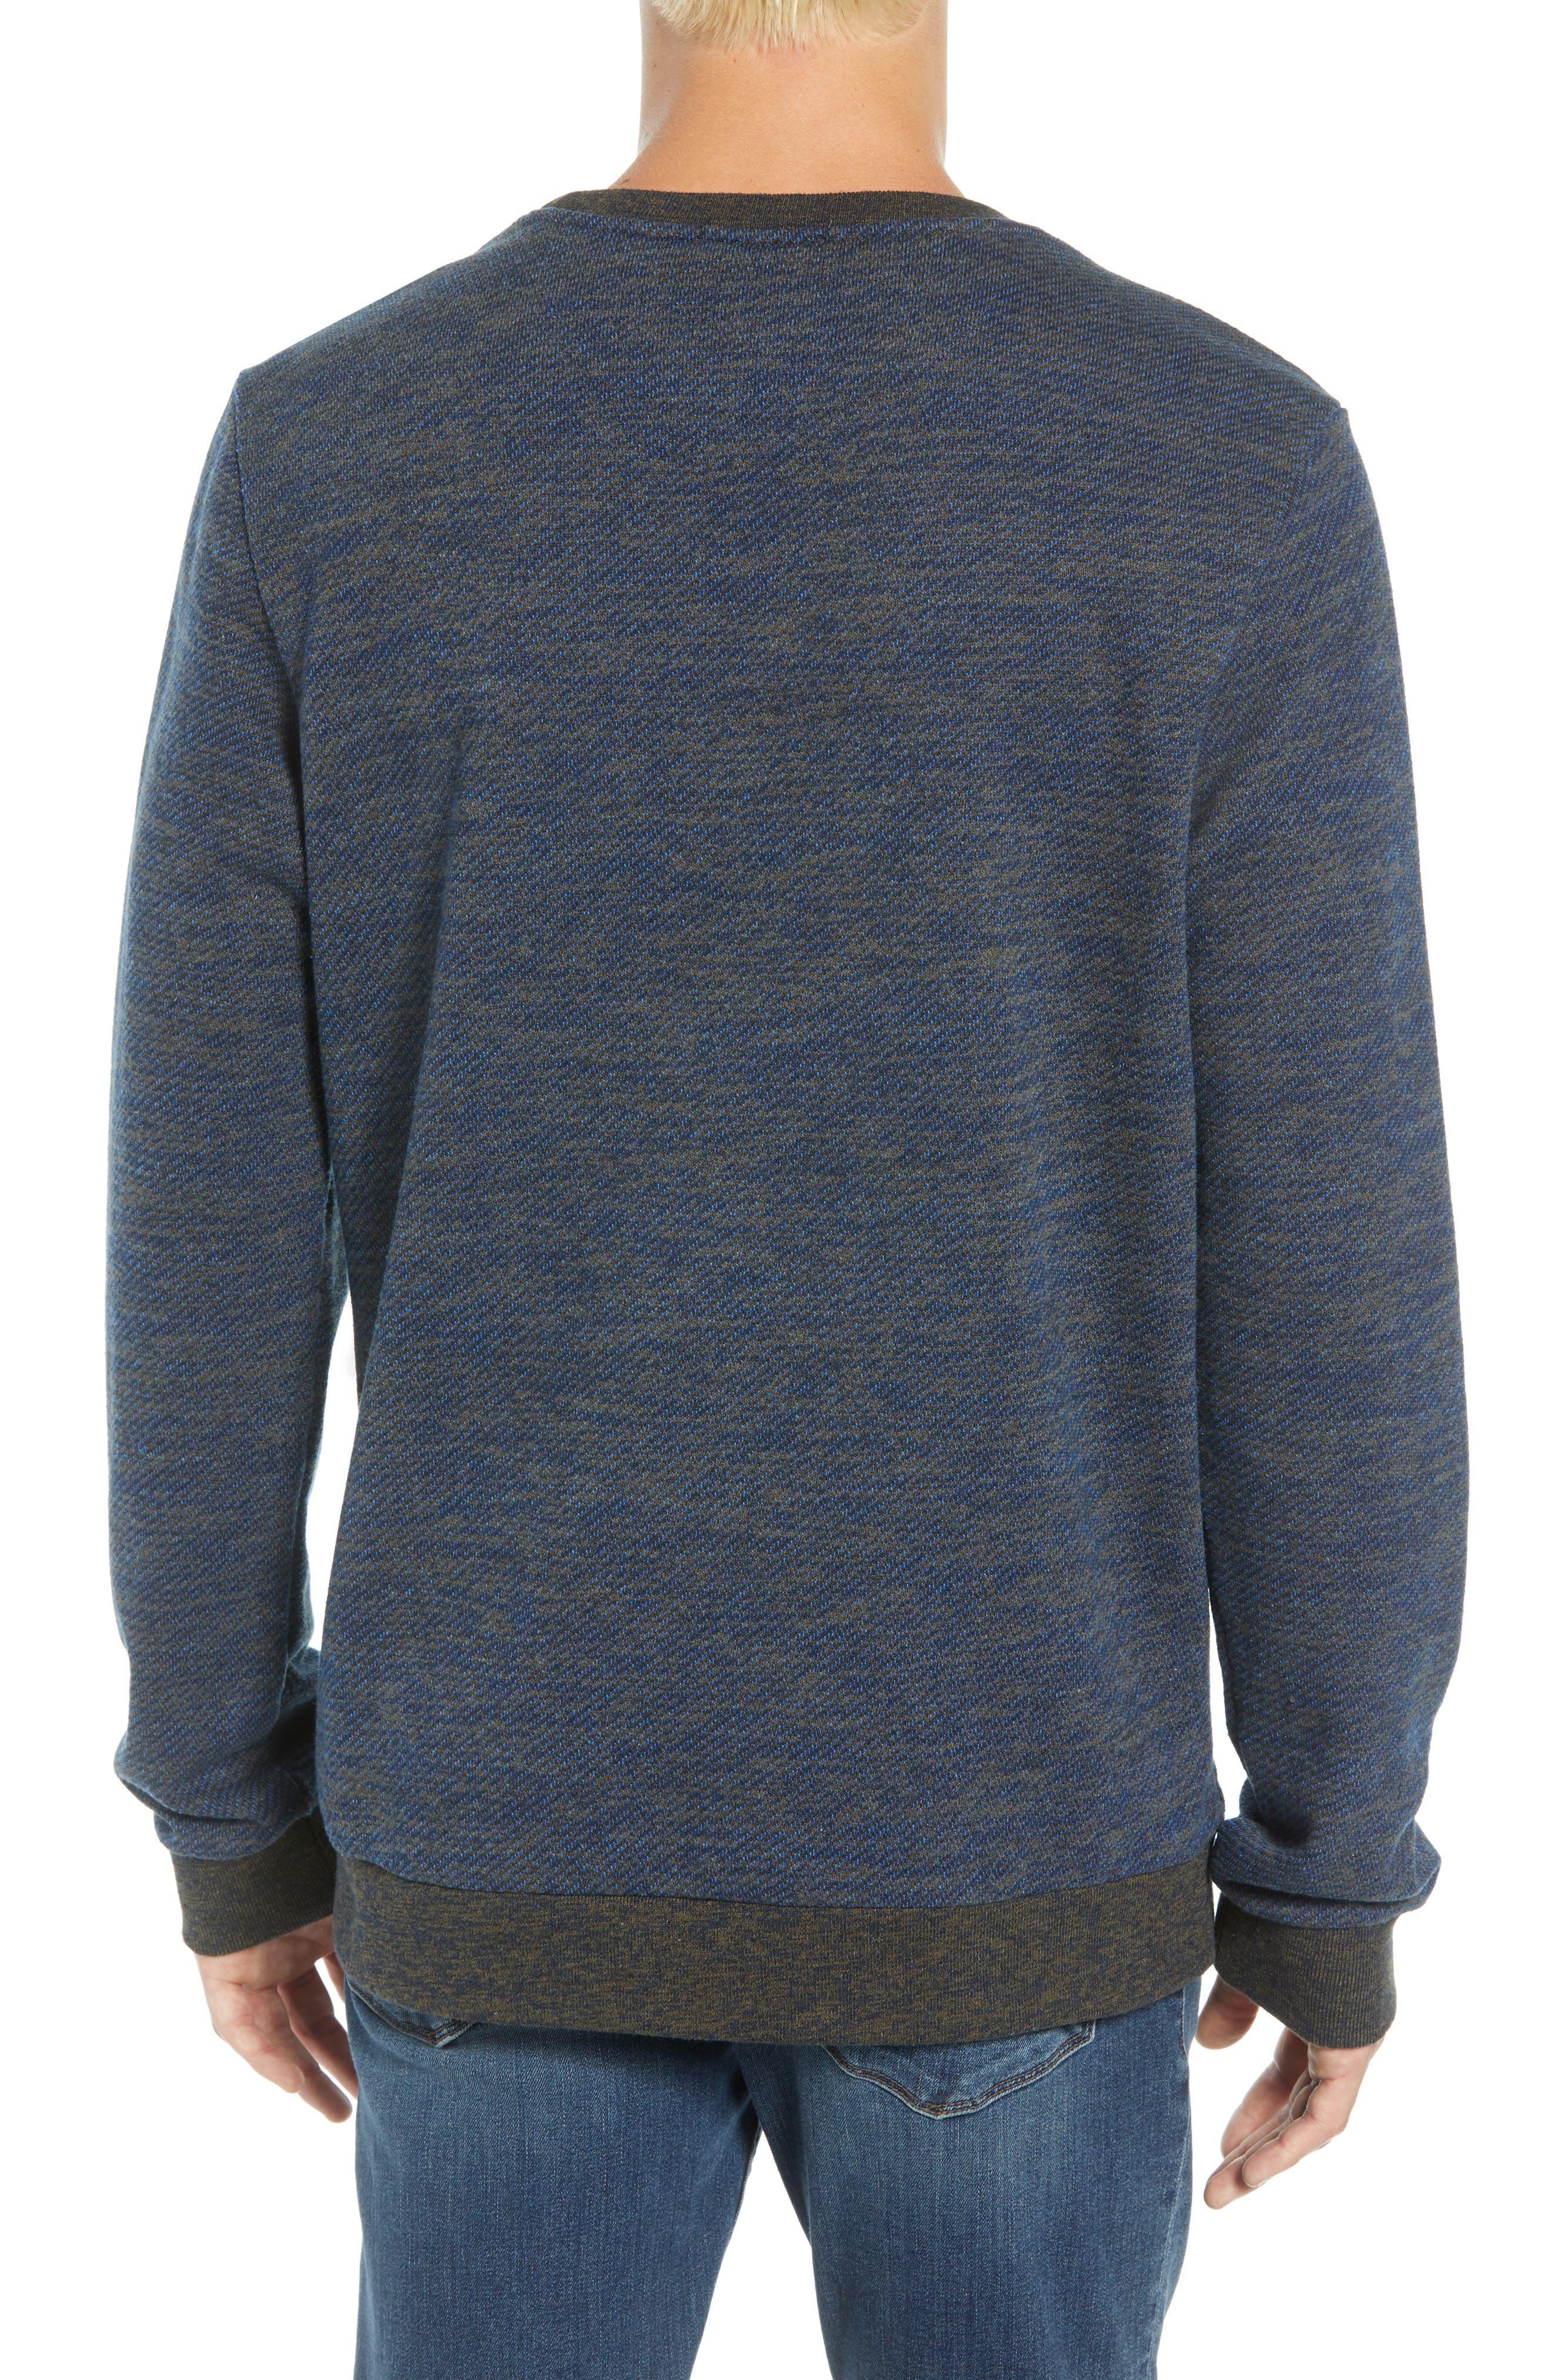 SCOTCH & SODA,                             Crewneck Sweatshirt,                             Alternate thumbnail 2, color,                             410